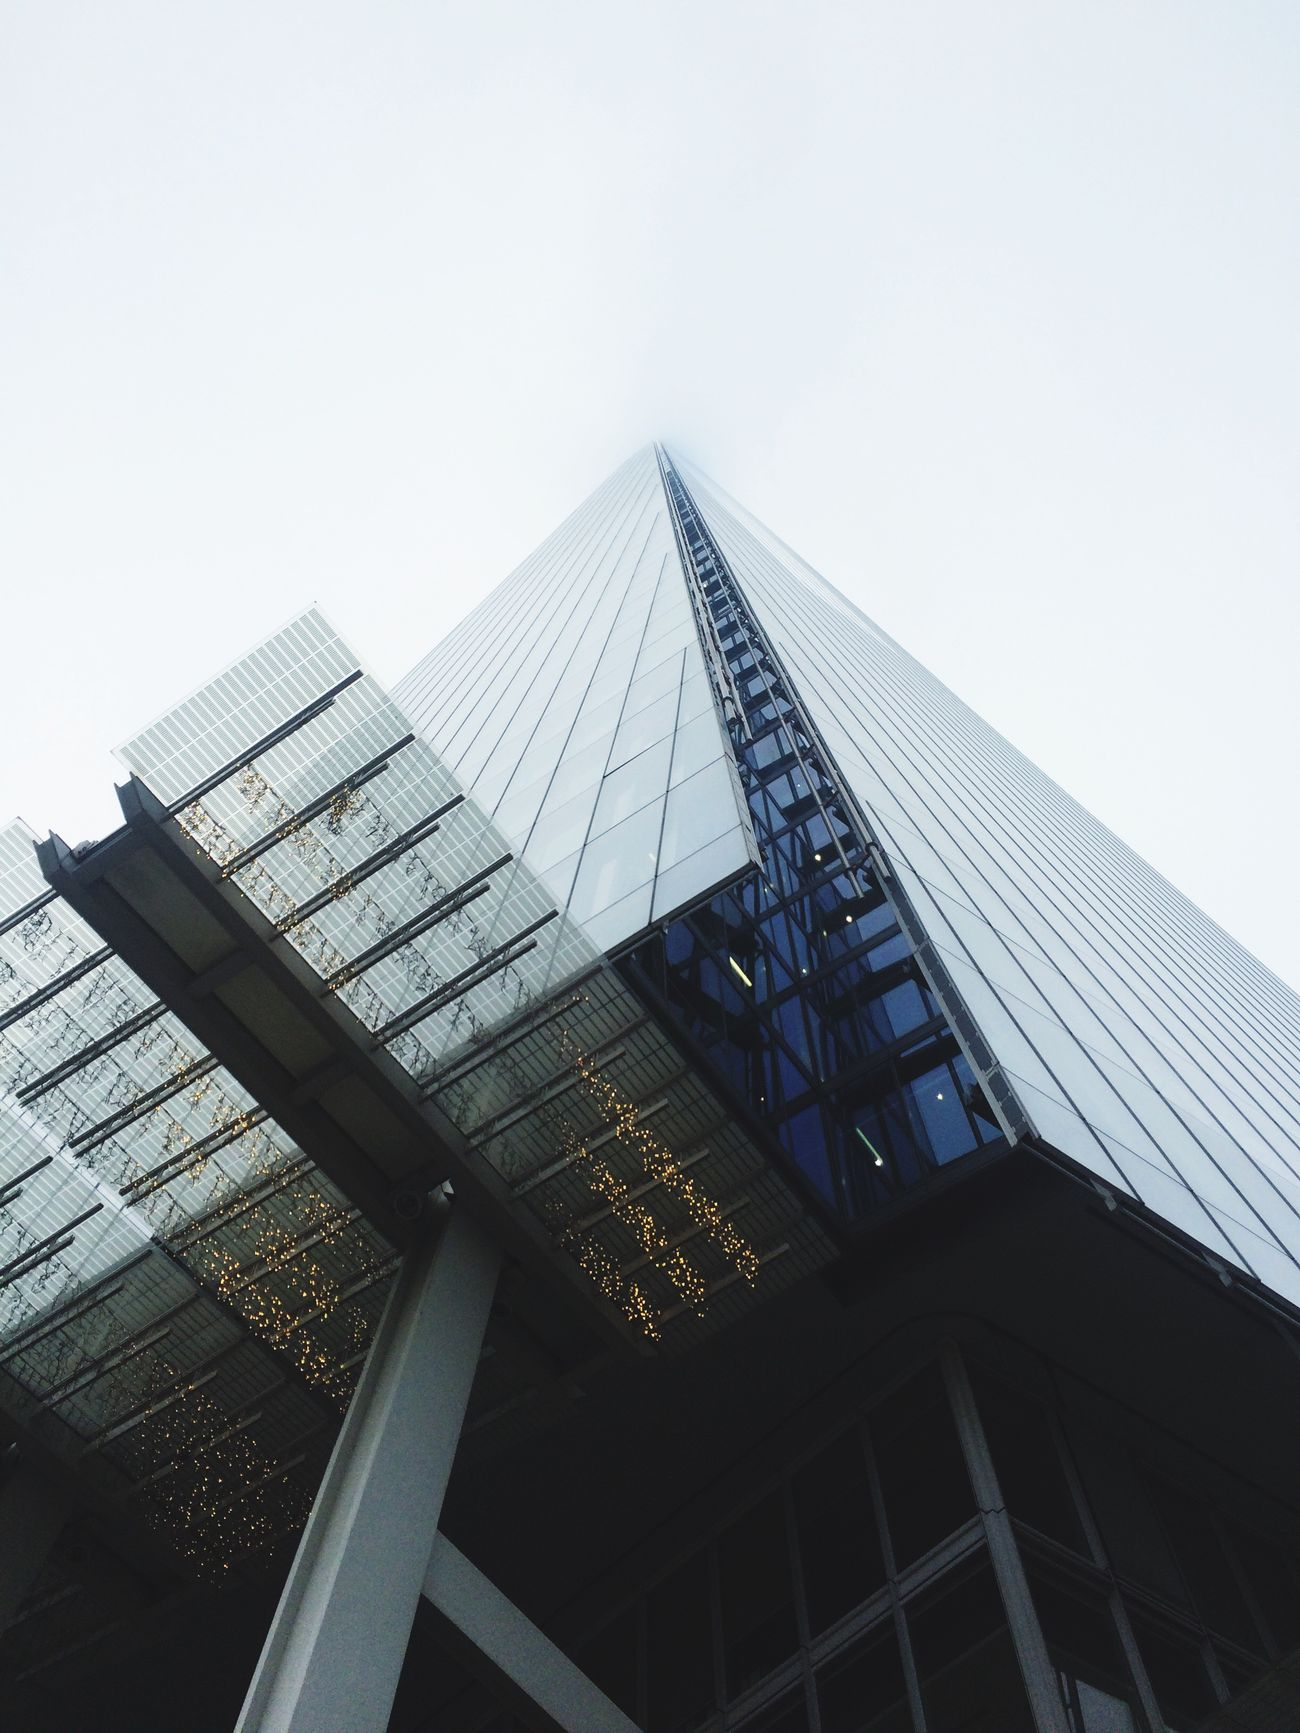 The Shard Architecture Skyscraper City Modern Tall